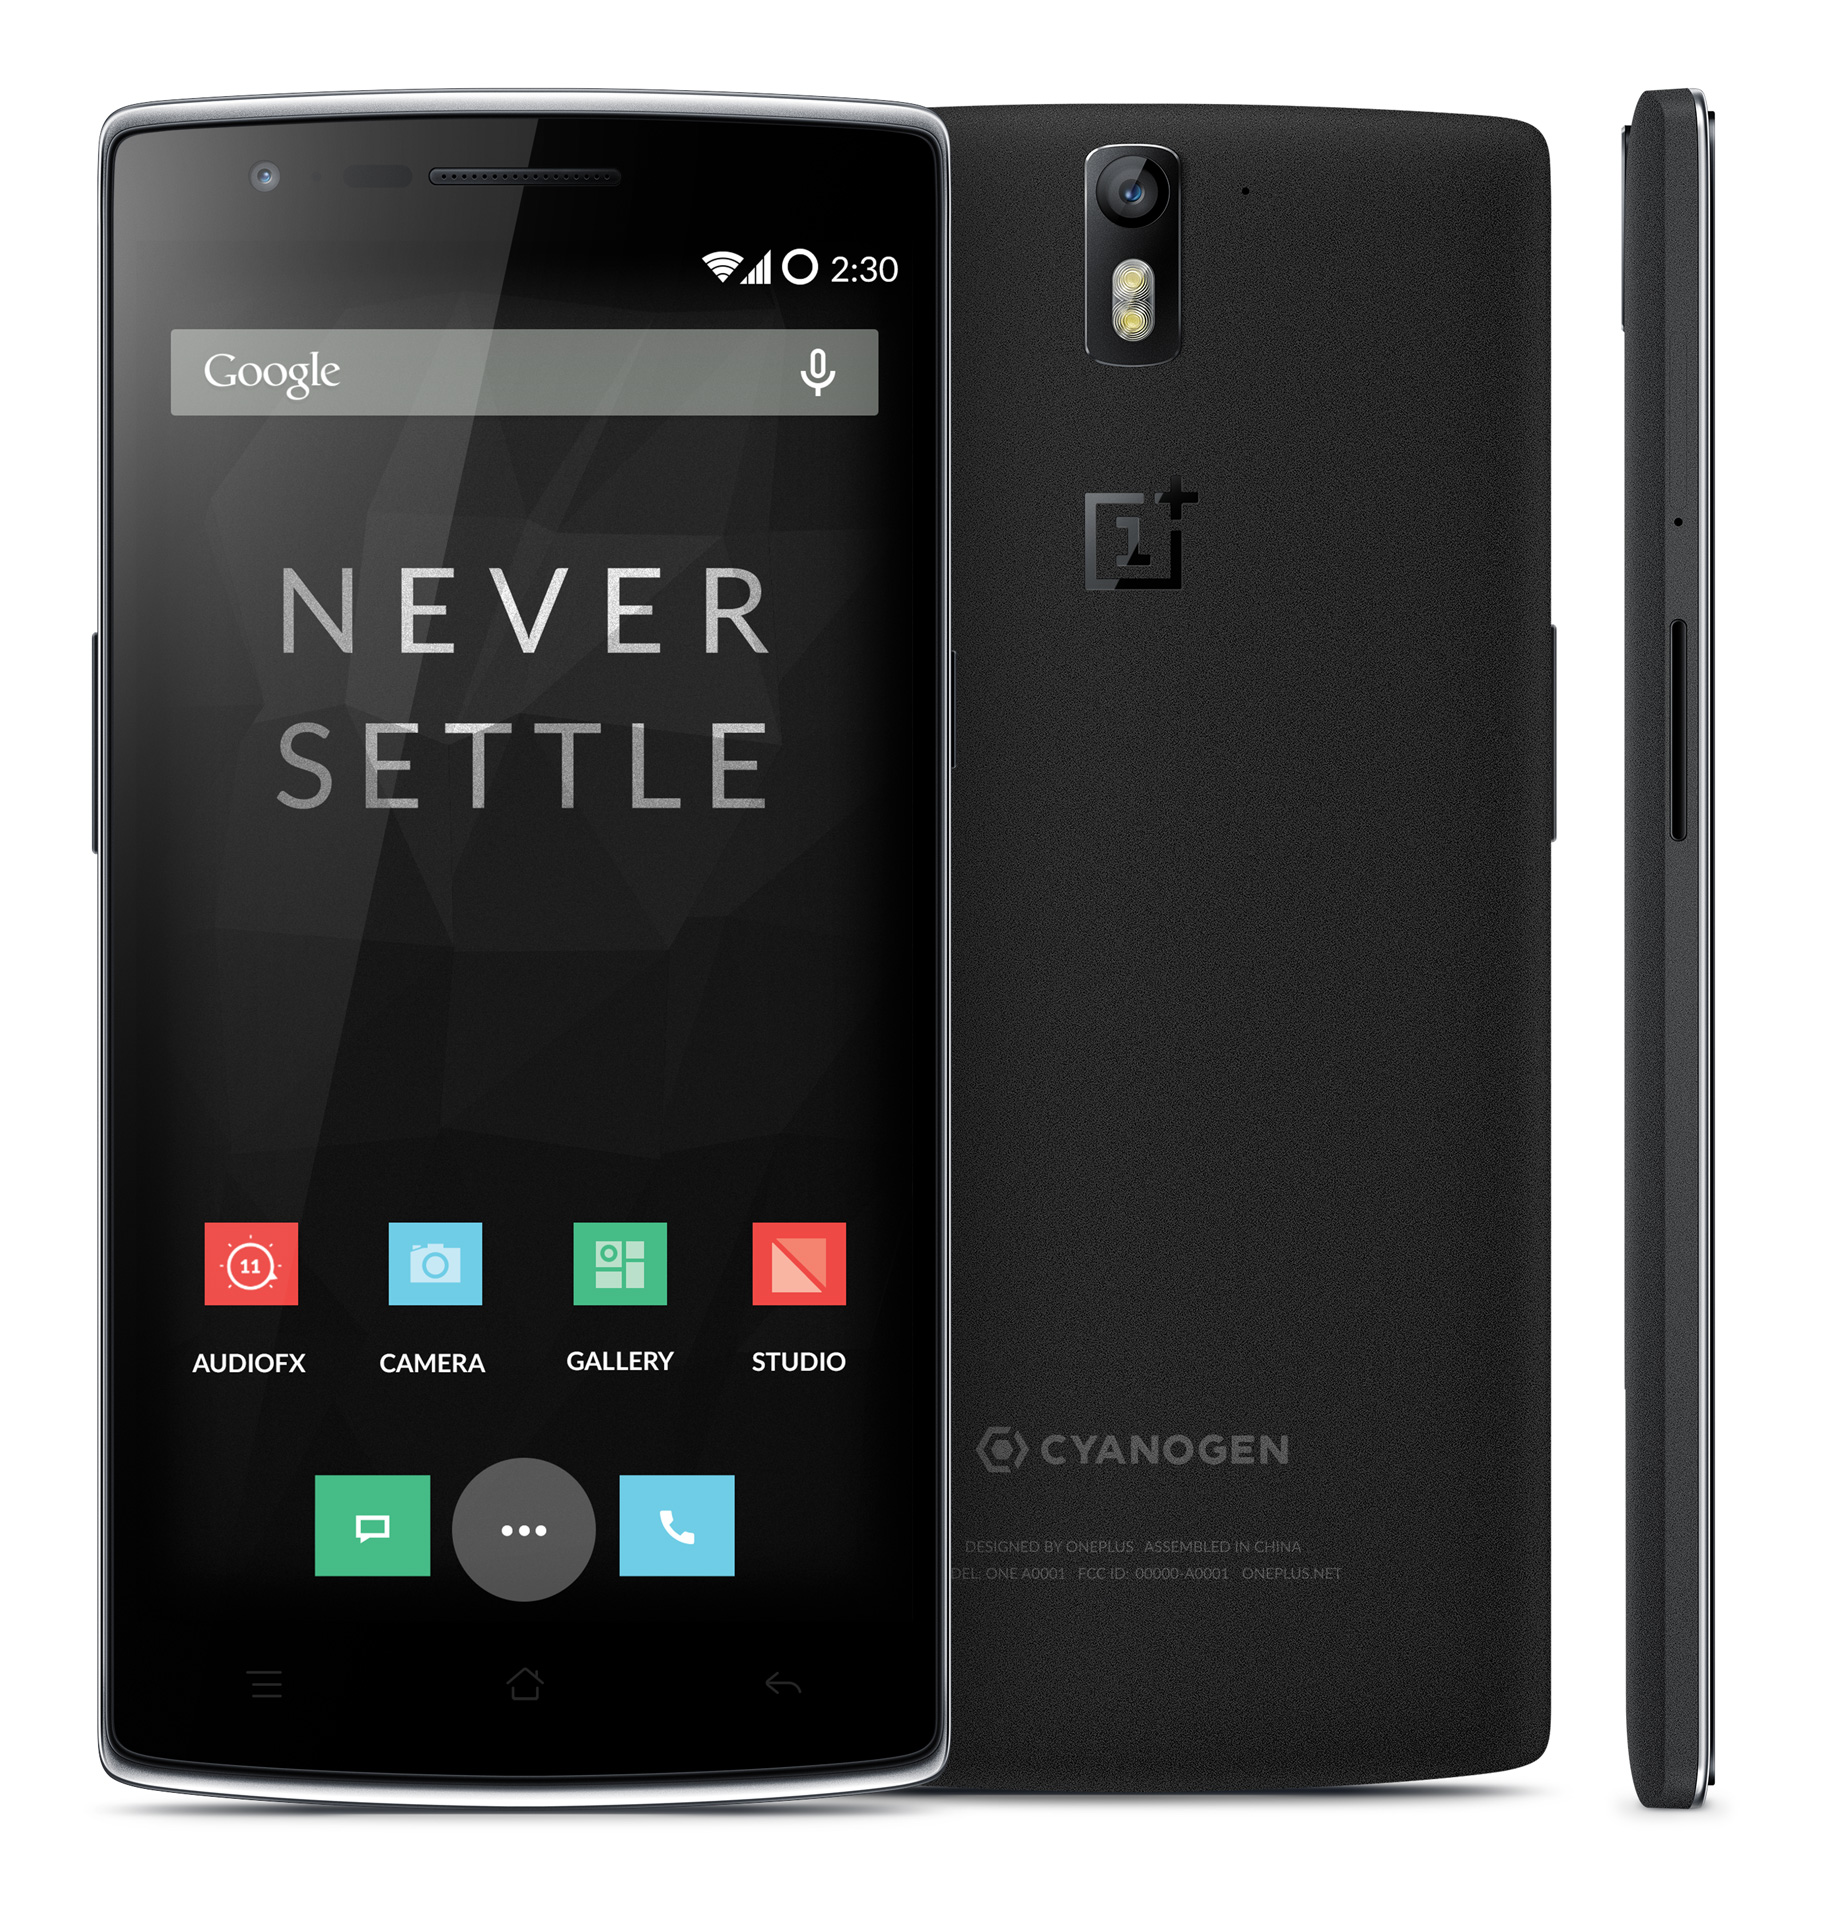 OnePlus One 64 GB Black Sandstone model